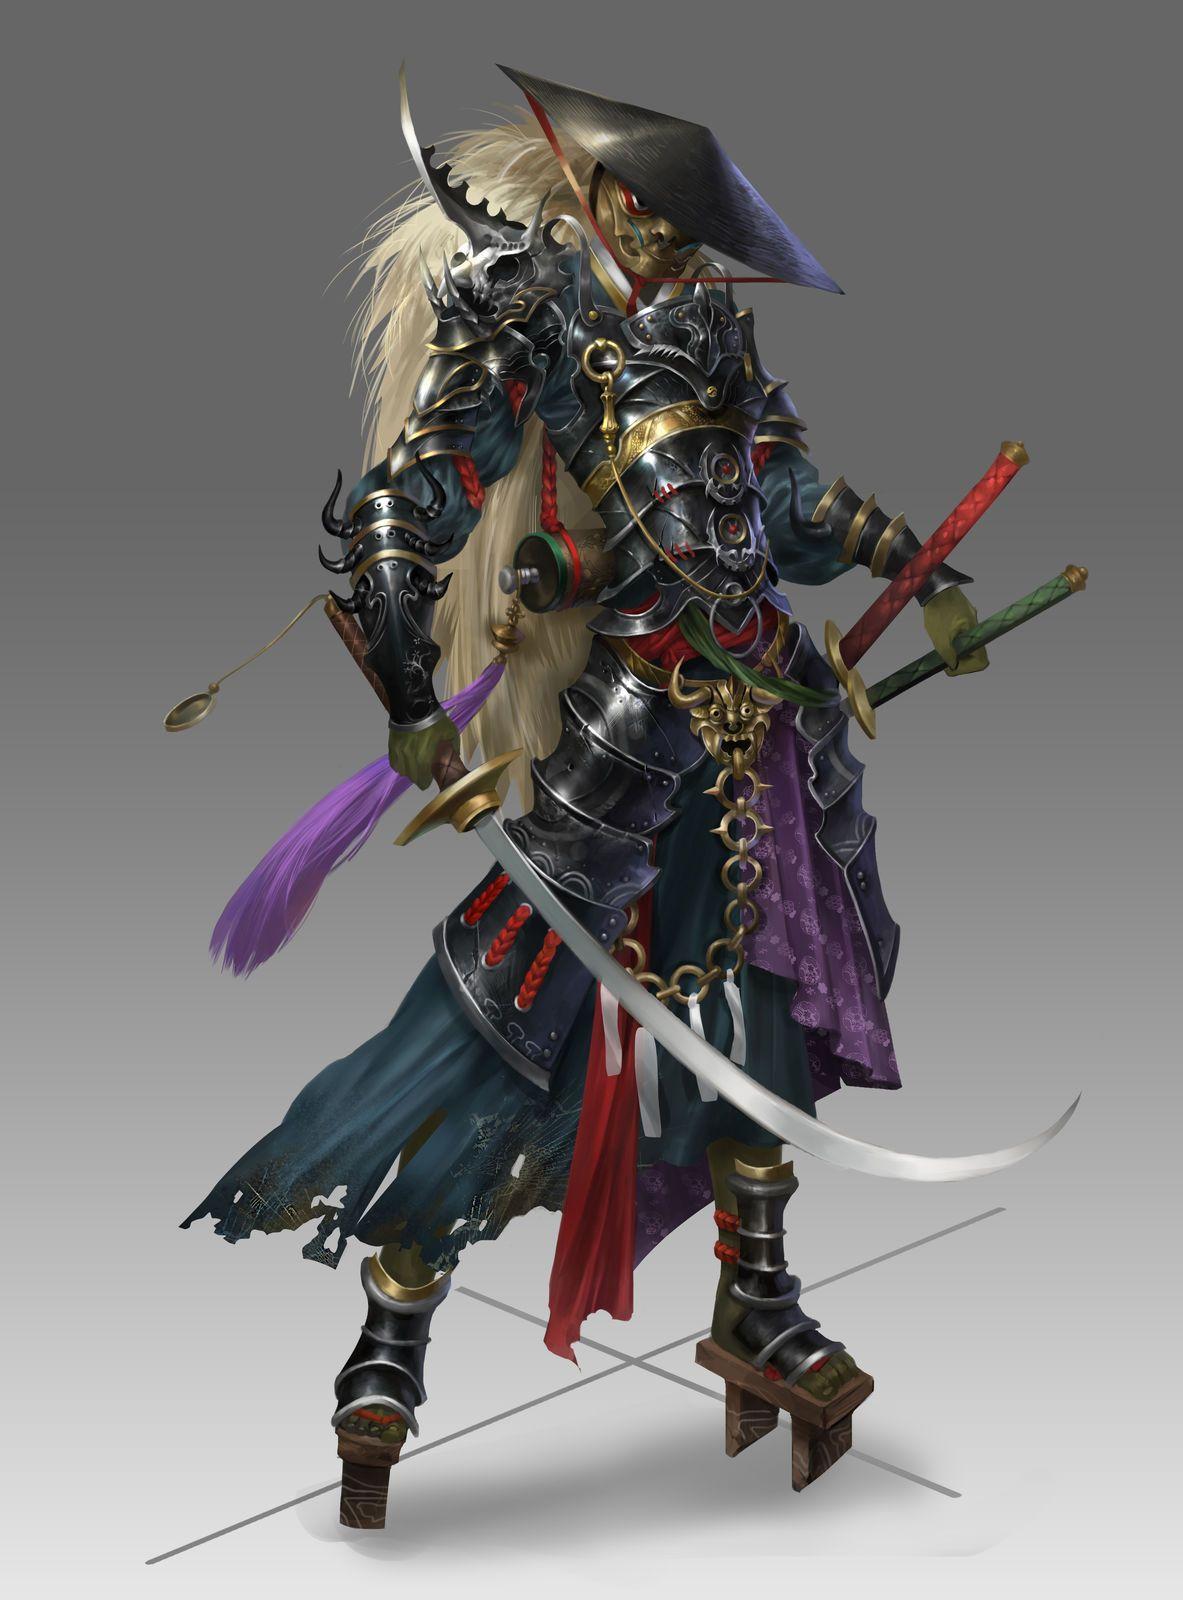 Samurai | Samurai art, Fantasy samurai, Samurai armor